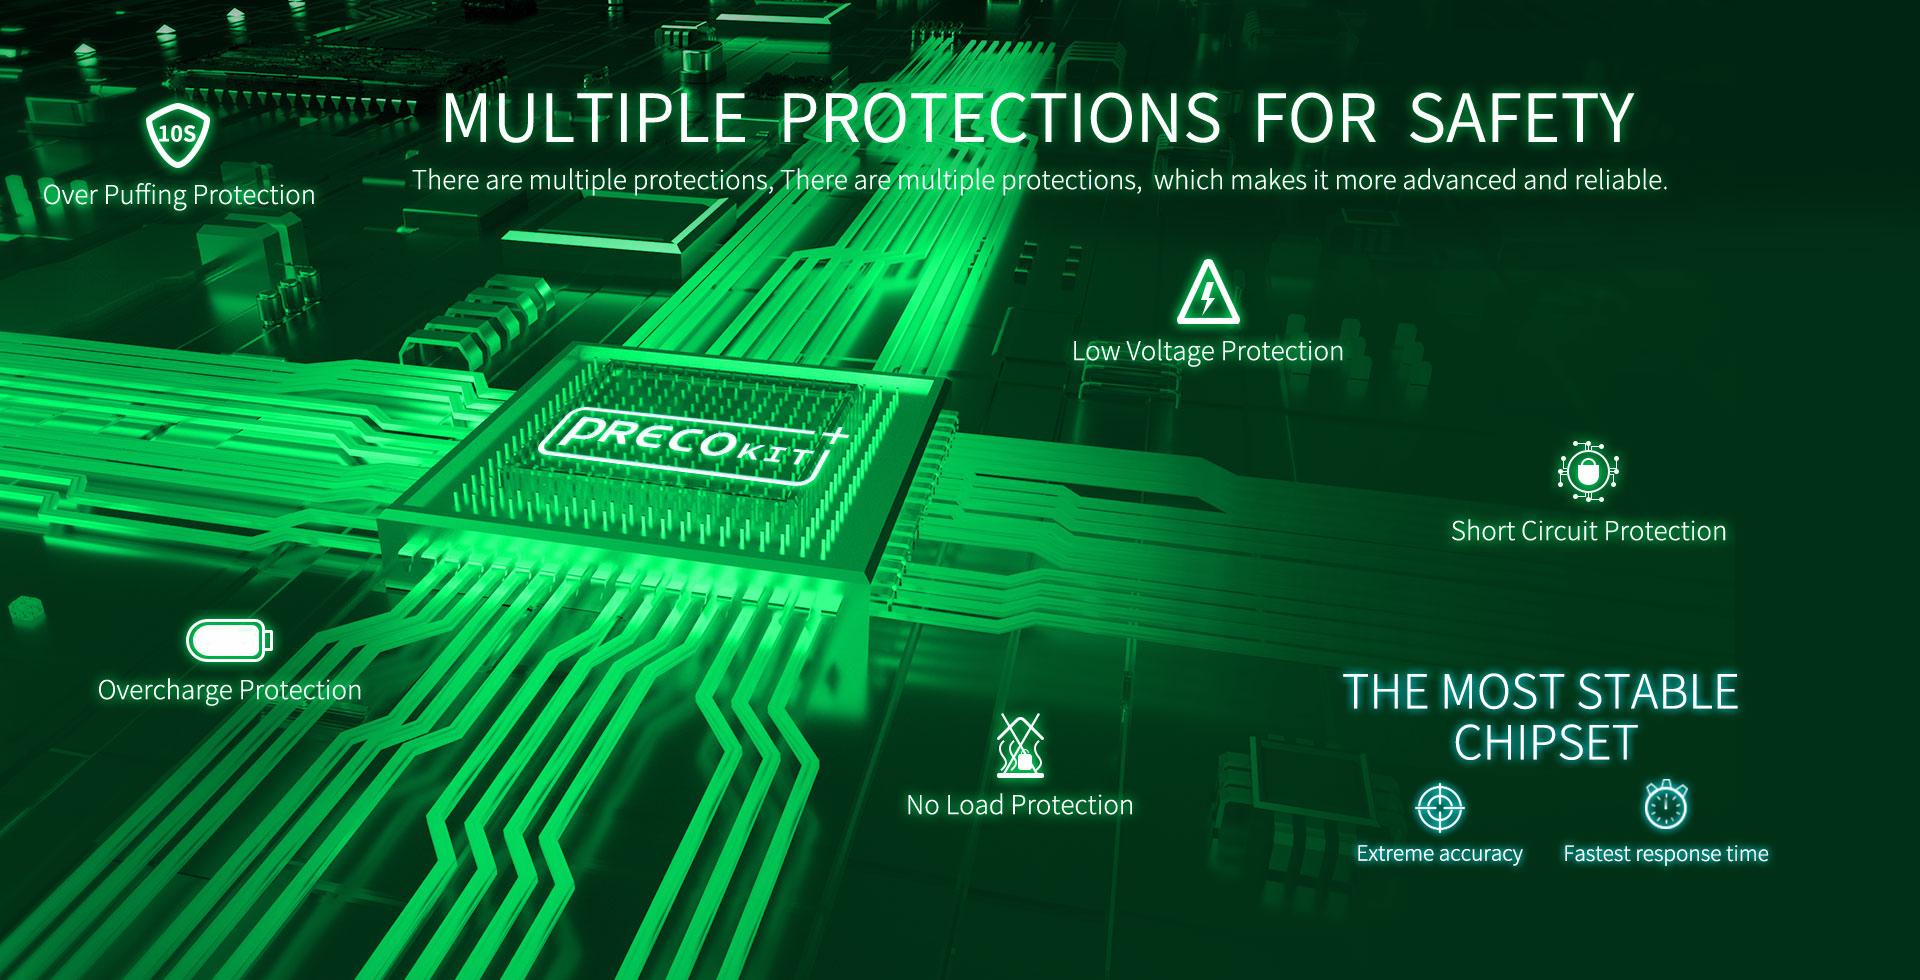 Vzone Preco Plus Kit Features 6